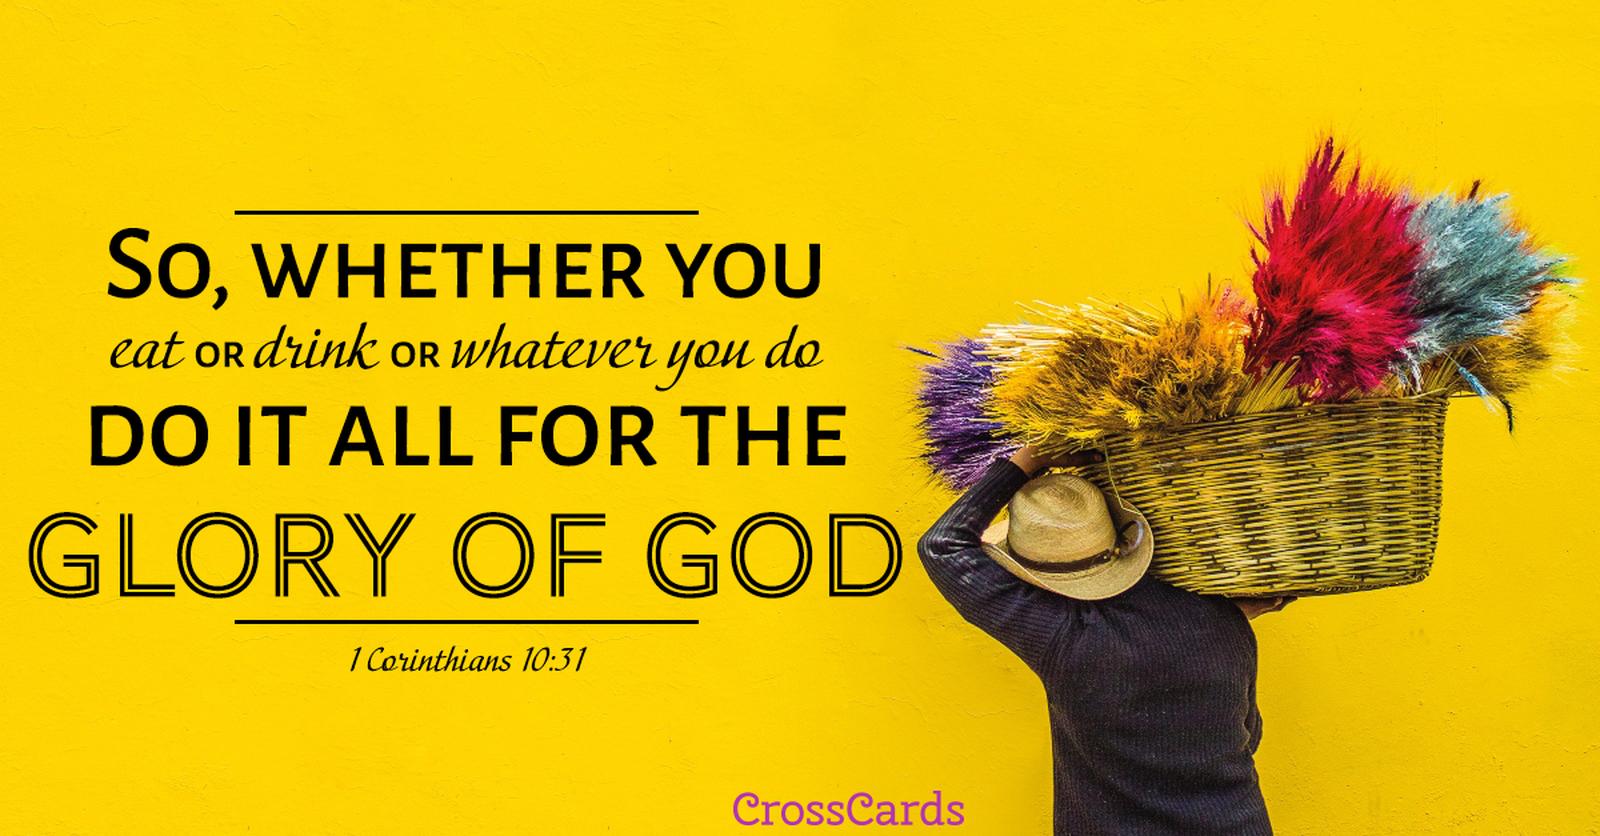 Your Daily Verse - 1 Corinthians 10:31